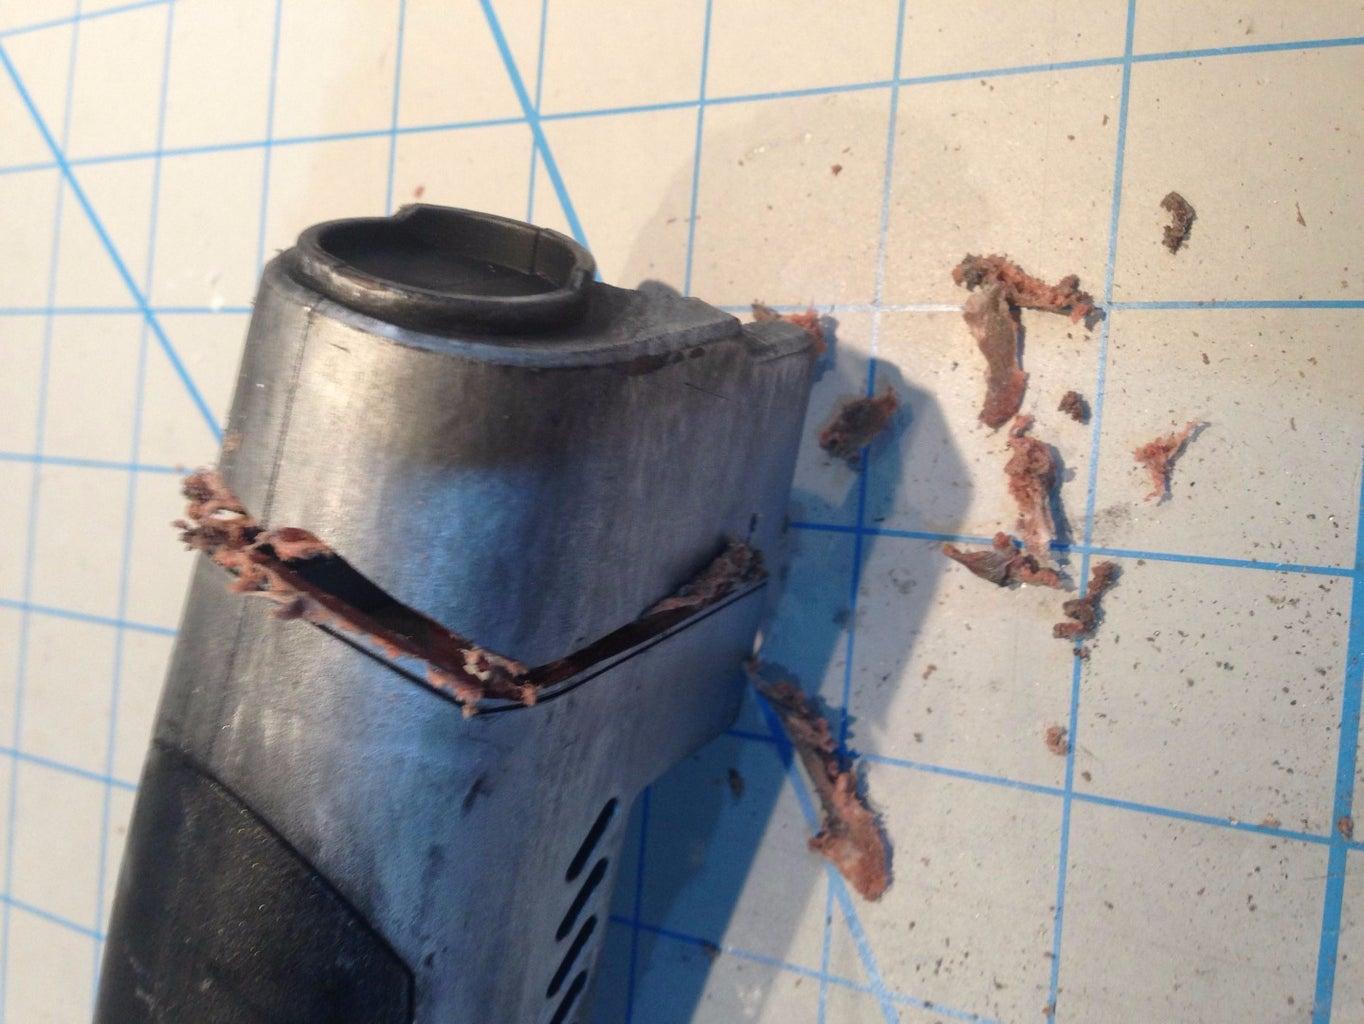 Replacing the Barrel Tip